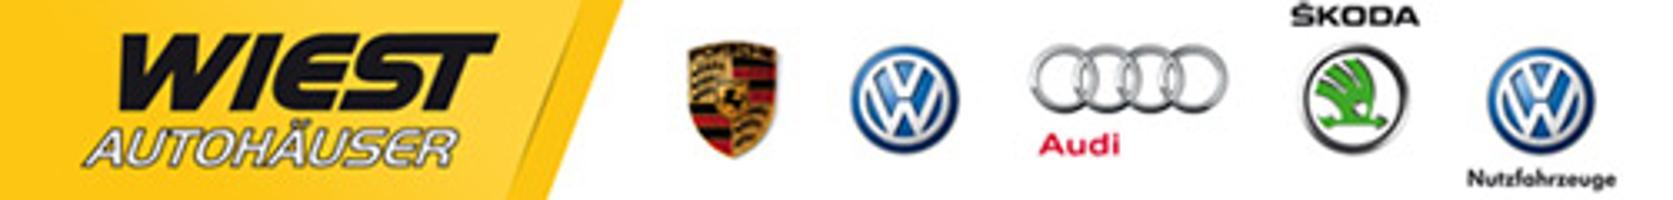 Autohaus J. Wiest & Söhne GmbH